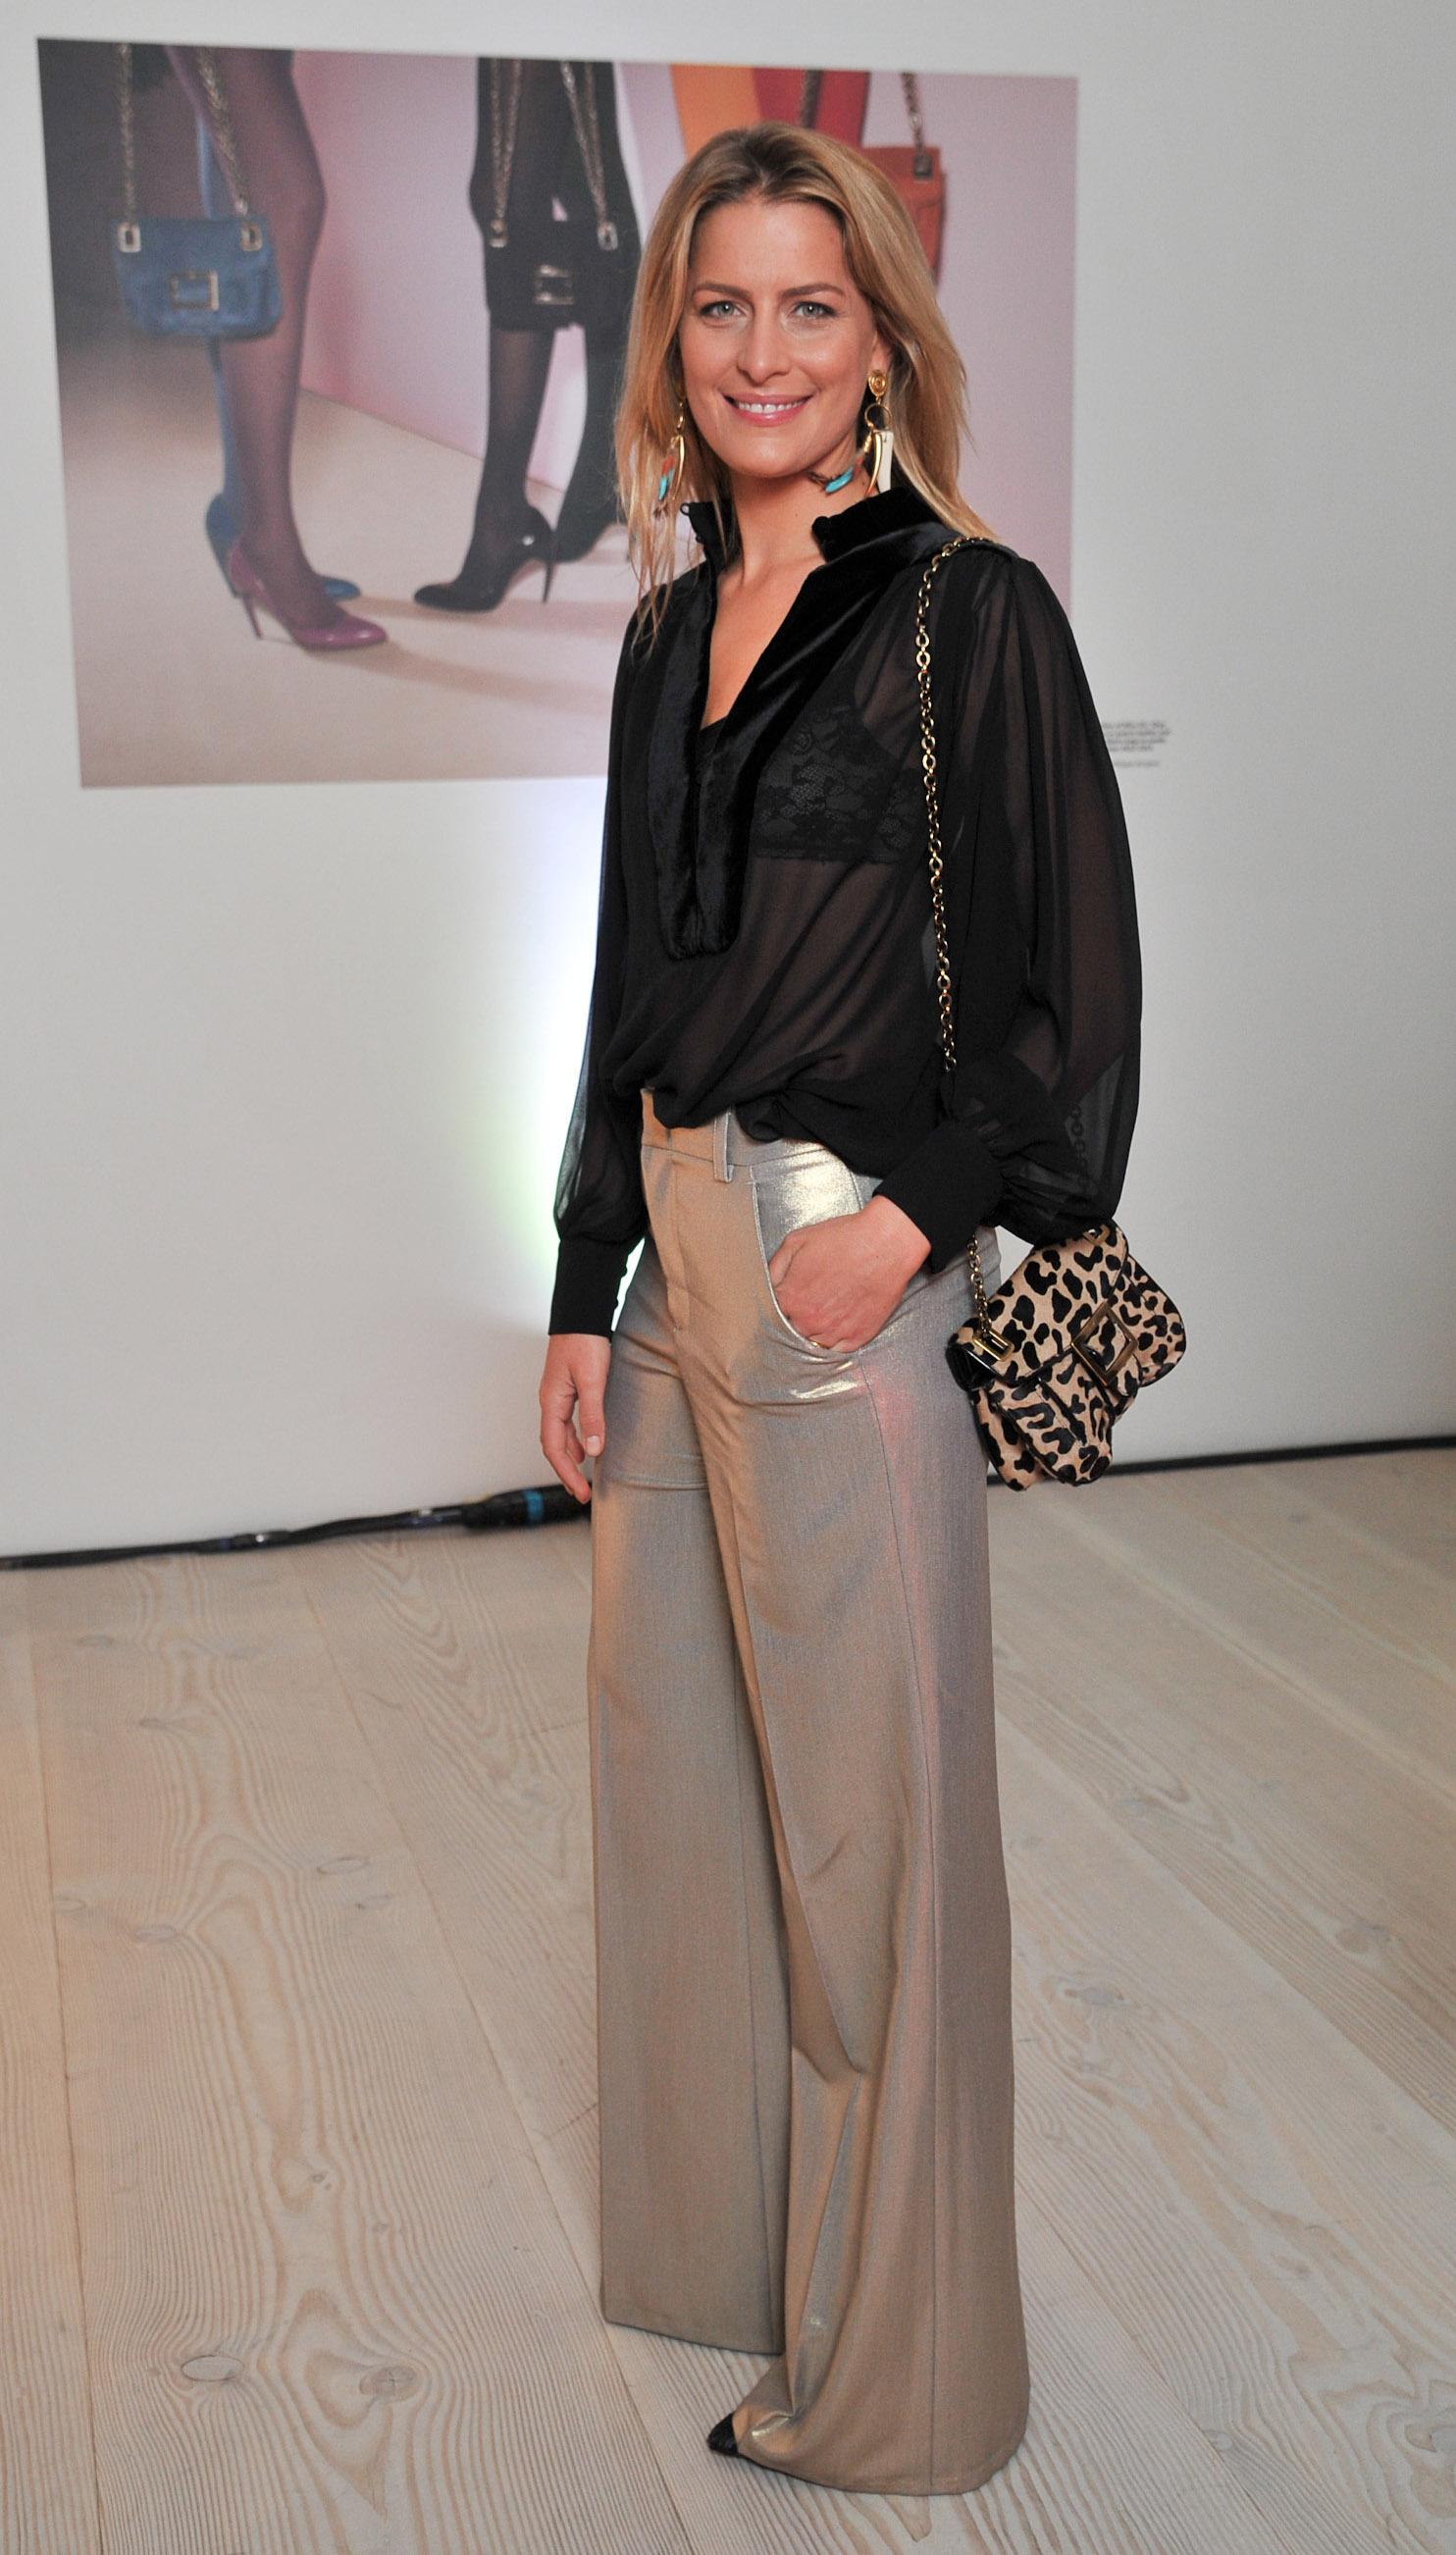 Her Royal Highness Princess Tatiana of Greece & Denmark